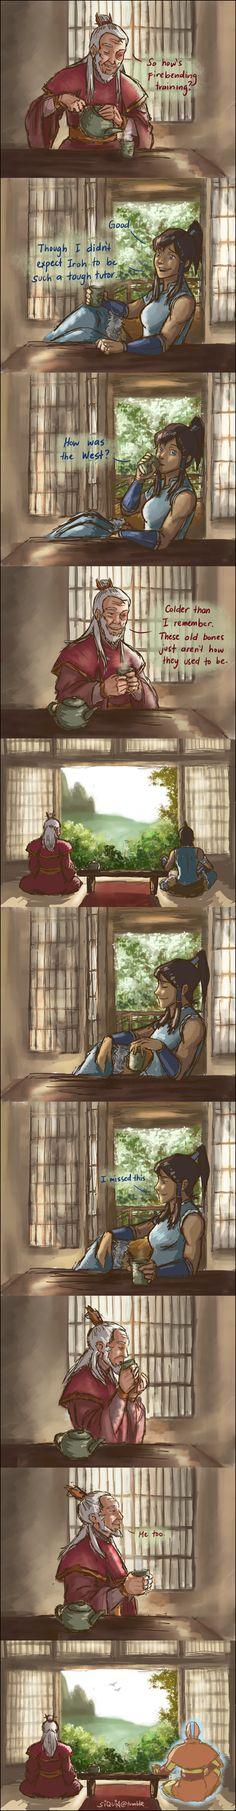 Avatar: The Legend of Korra - Zuko and Korra